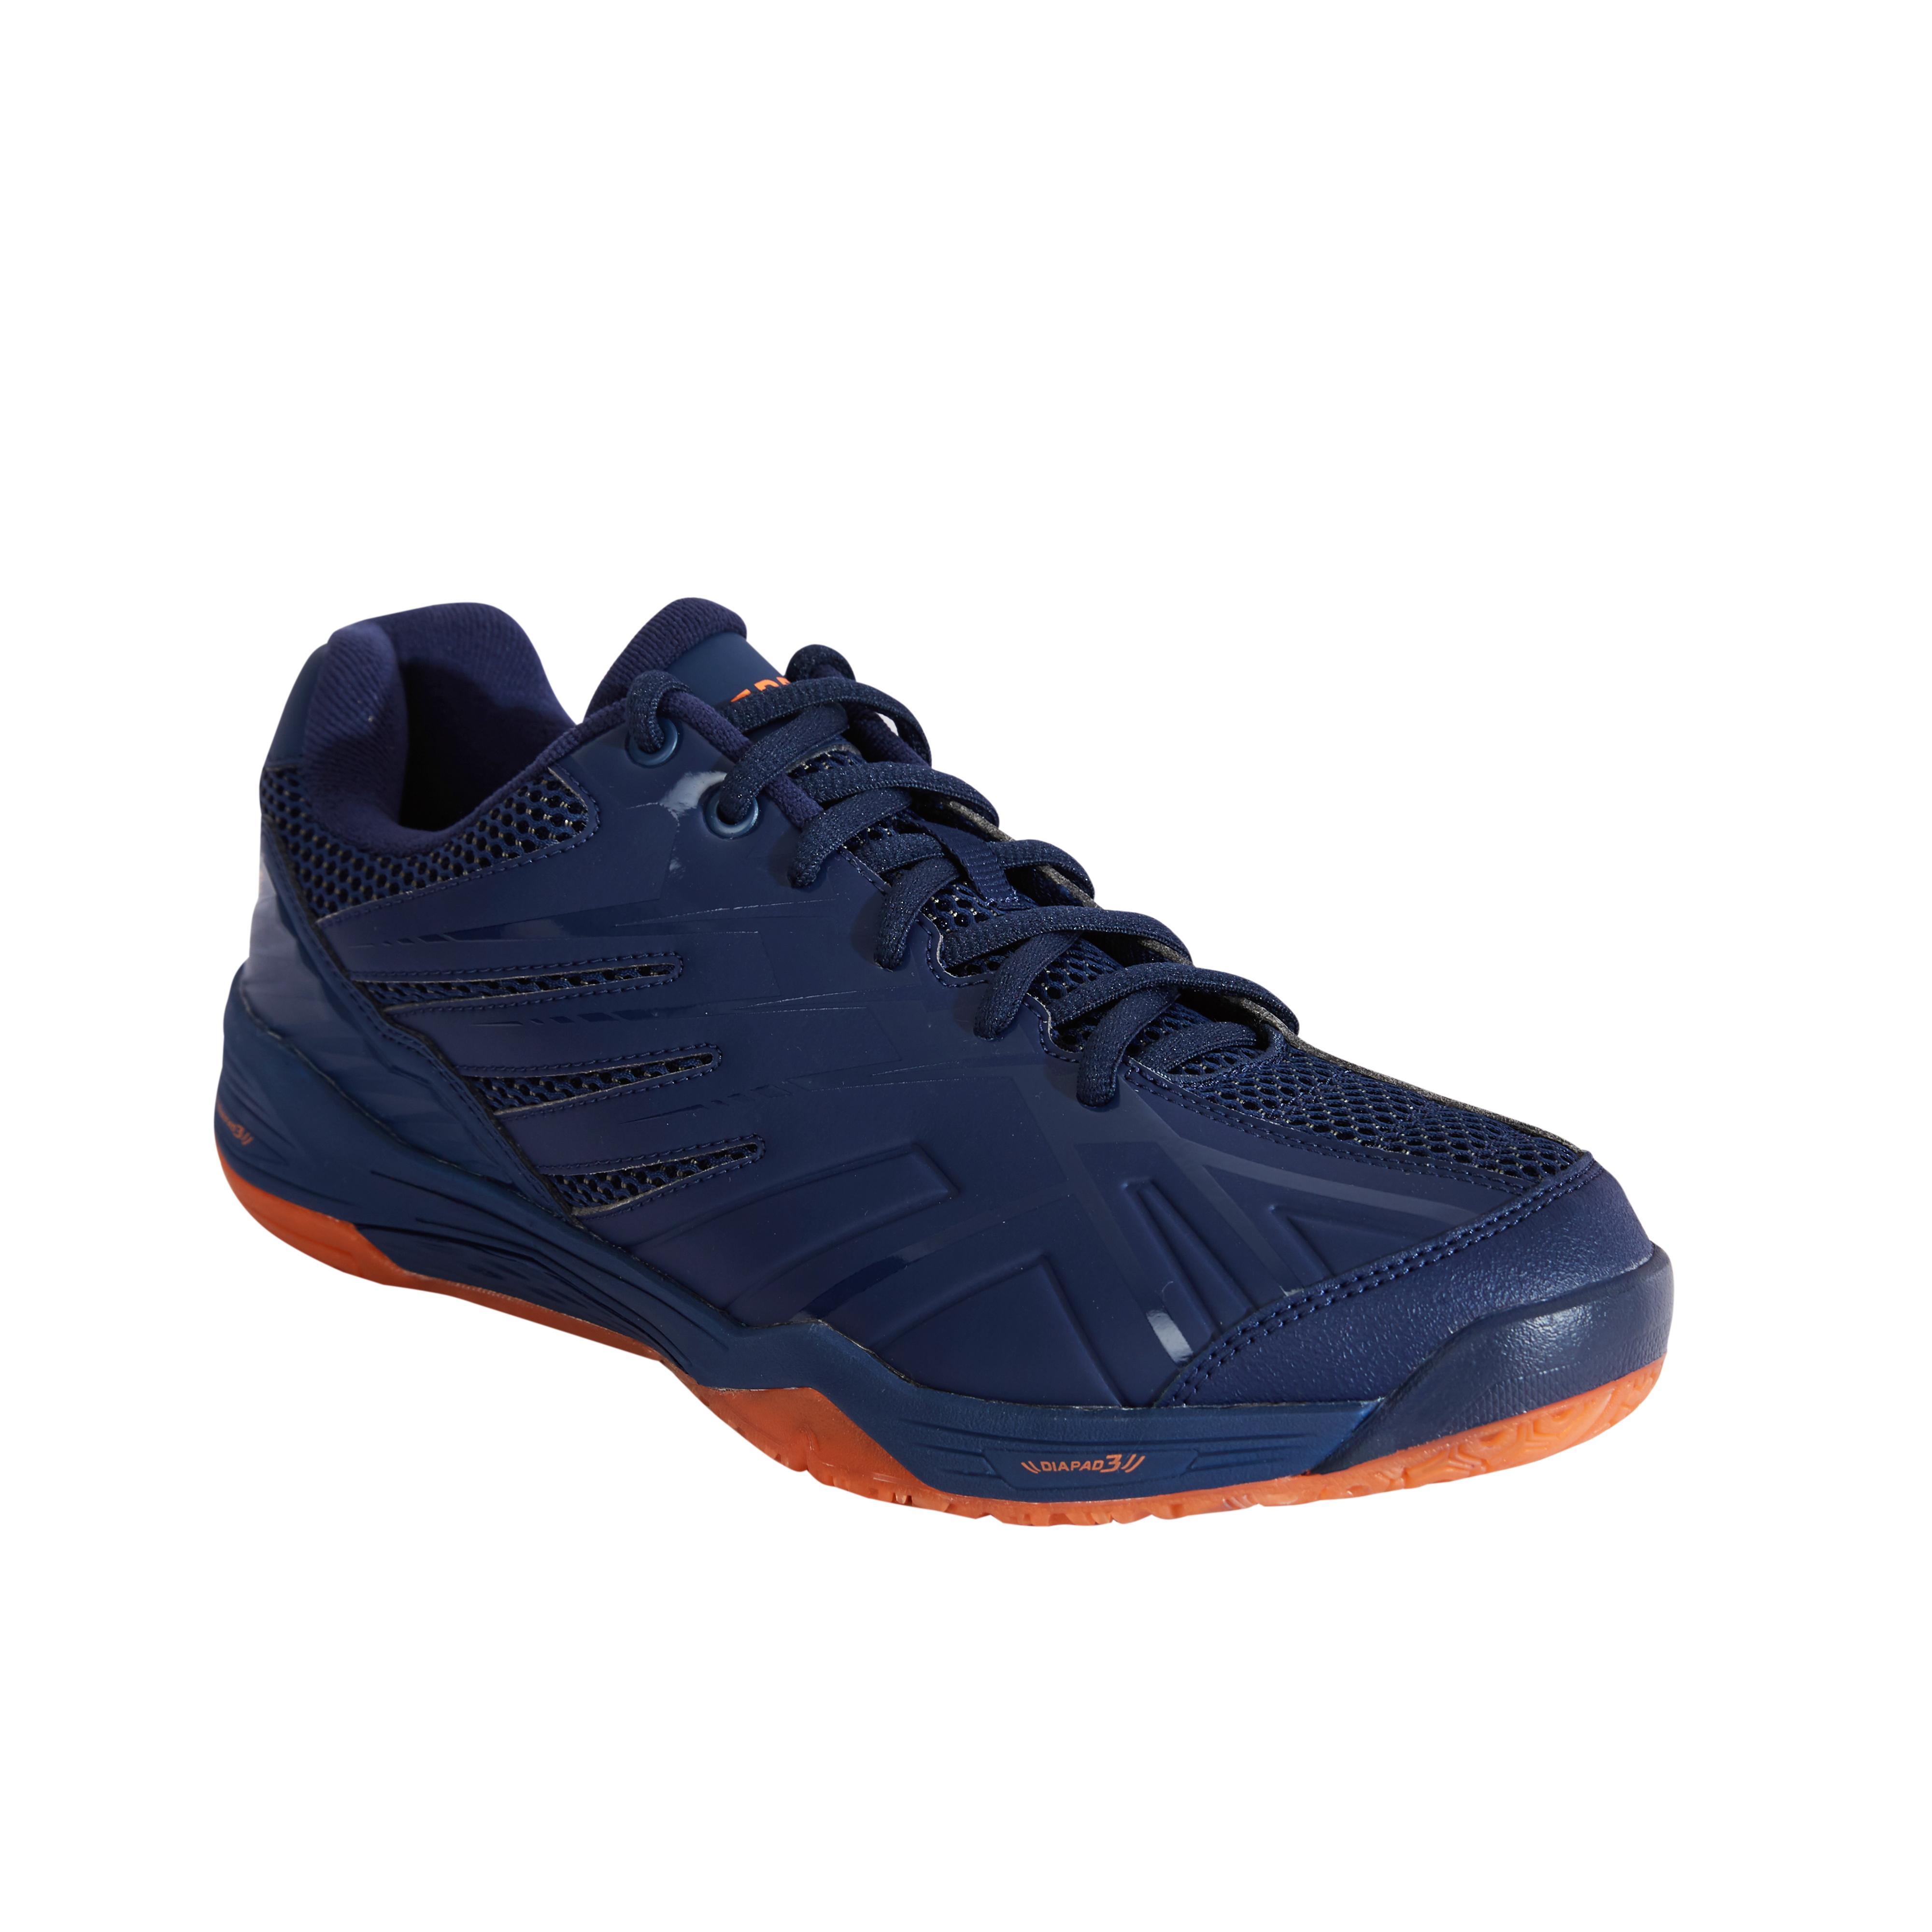 Perfly Chaussures De Badminton BS590 Max Comfort - Marine/Orange - Perfly